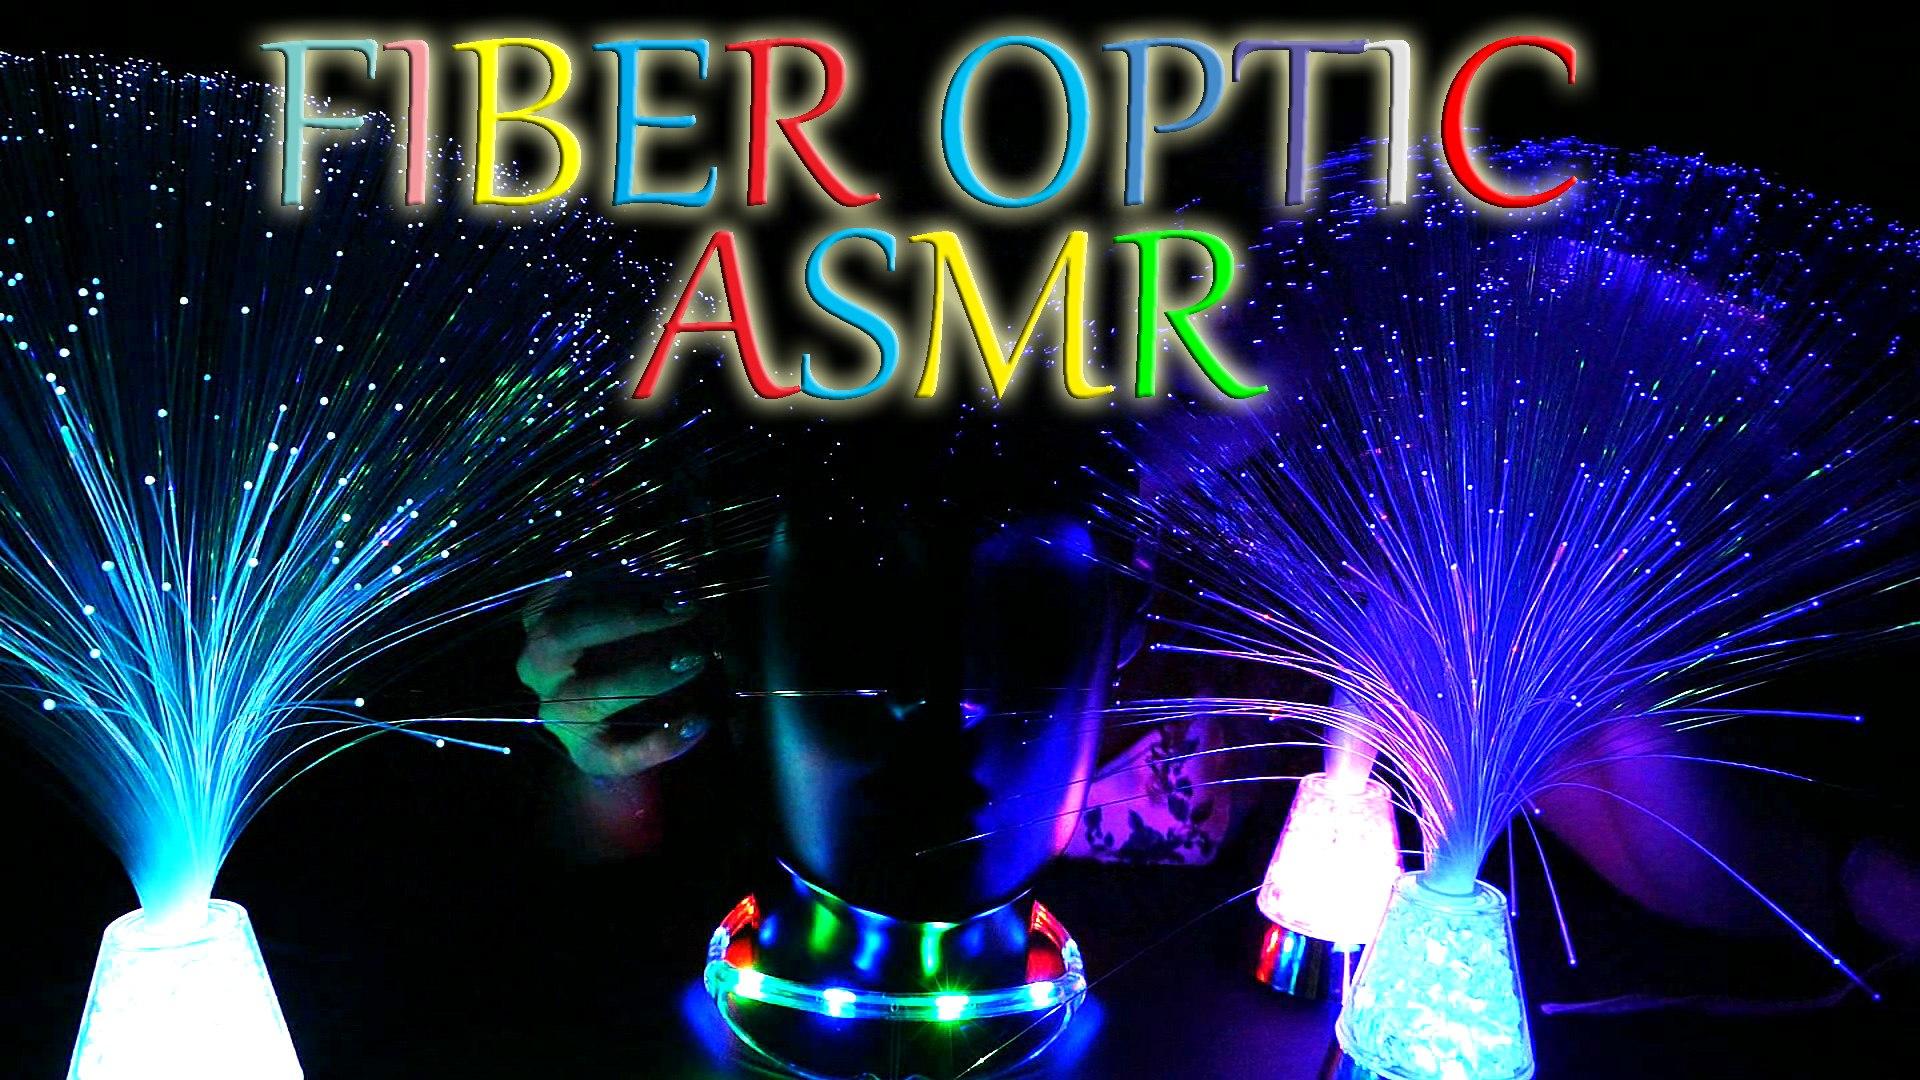 Sleep Inducing Fiber Optic Ear Massage & Binaural ASMR Relaxing Ear to Ear Whisper